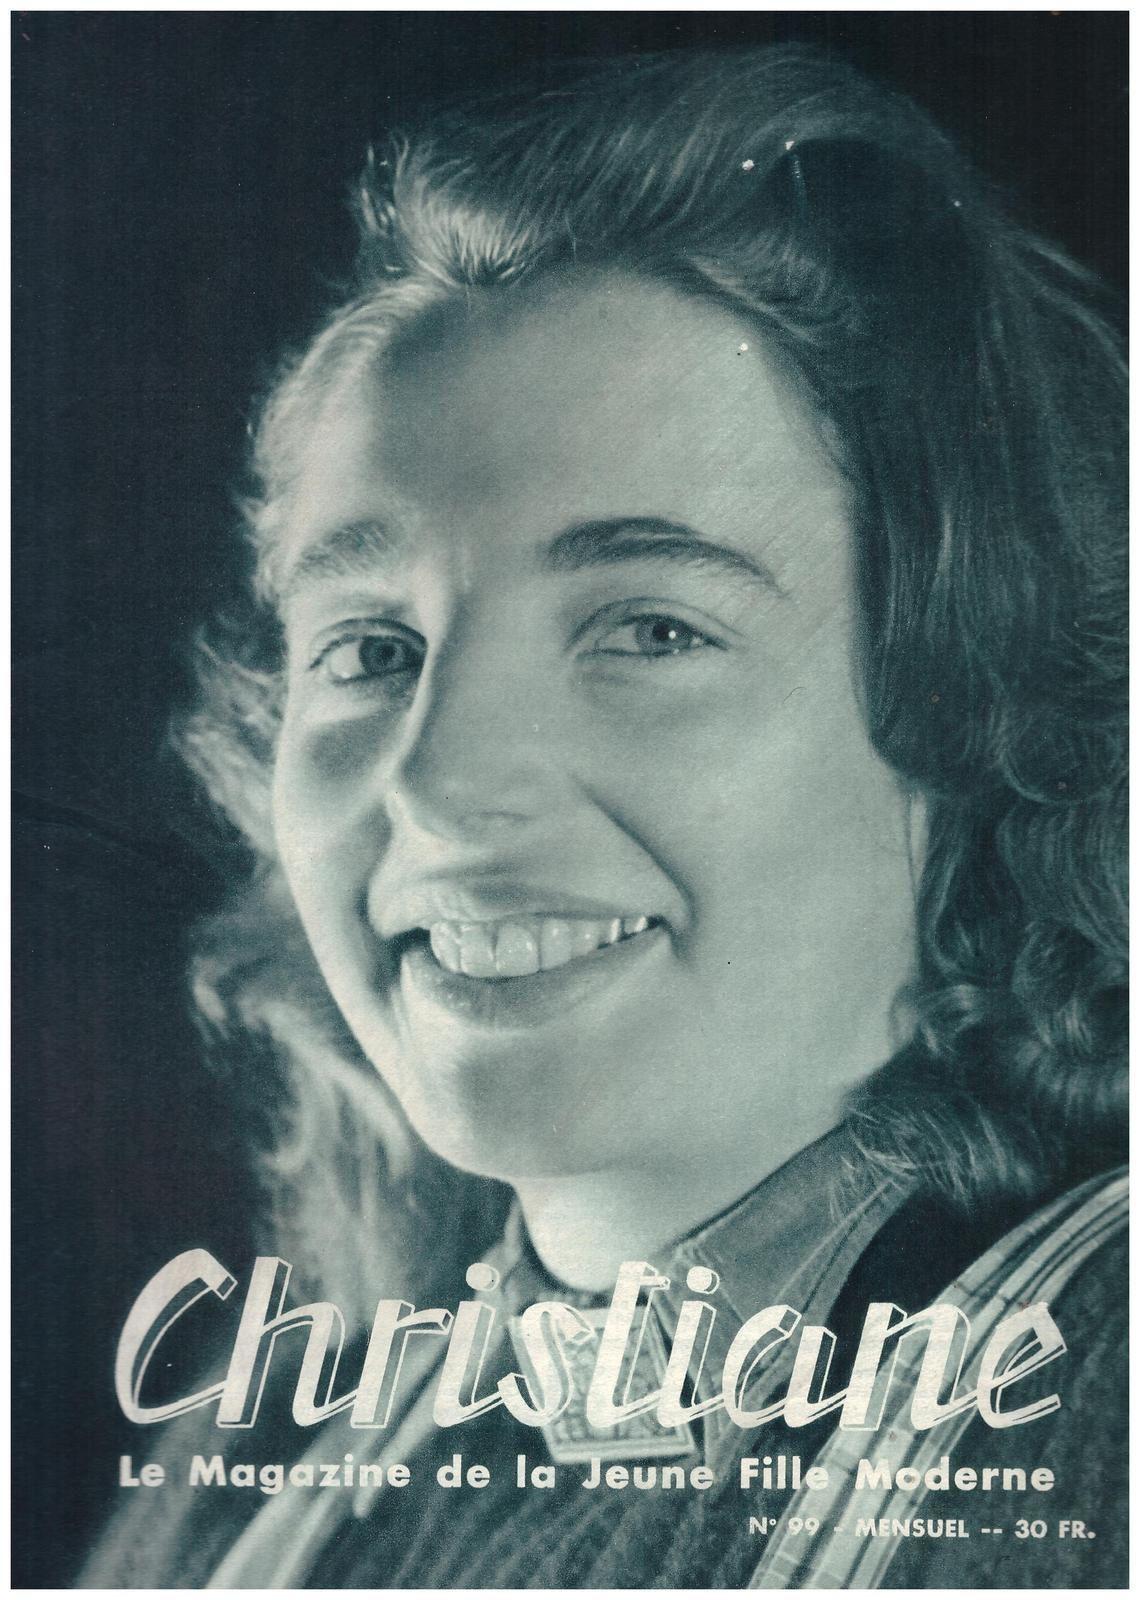 Christiane n°99 de novembre 1955